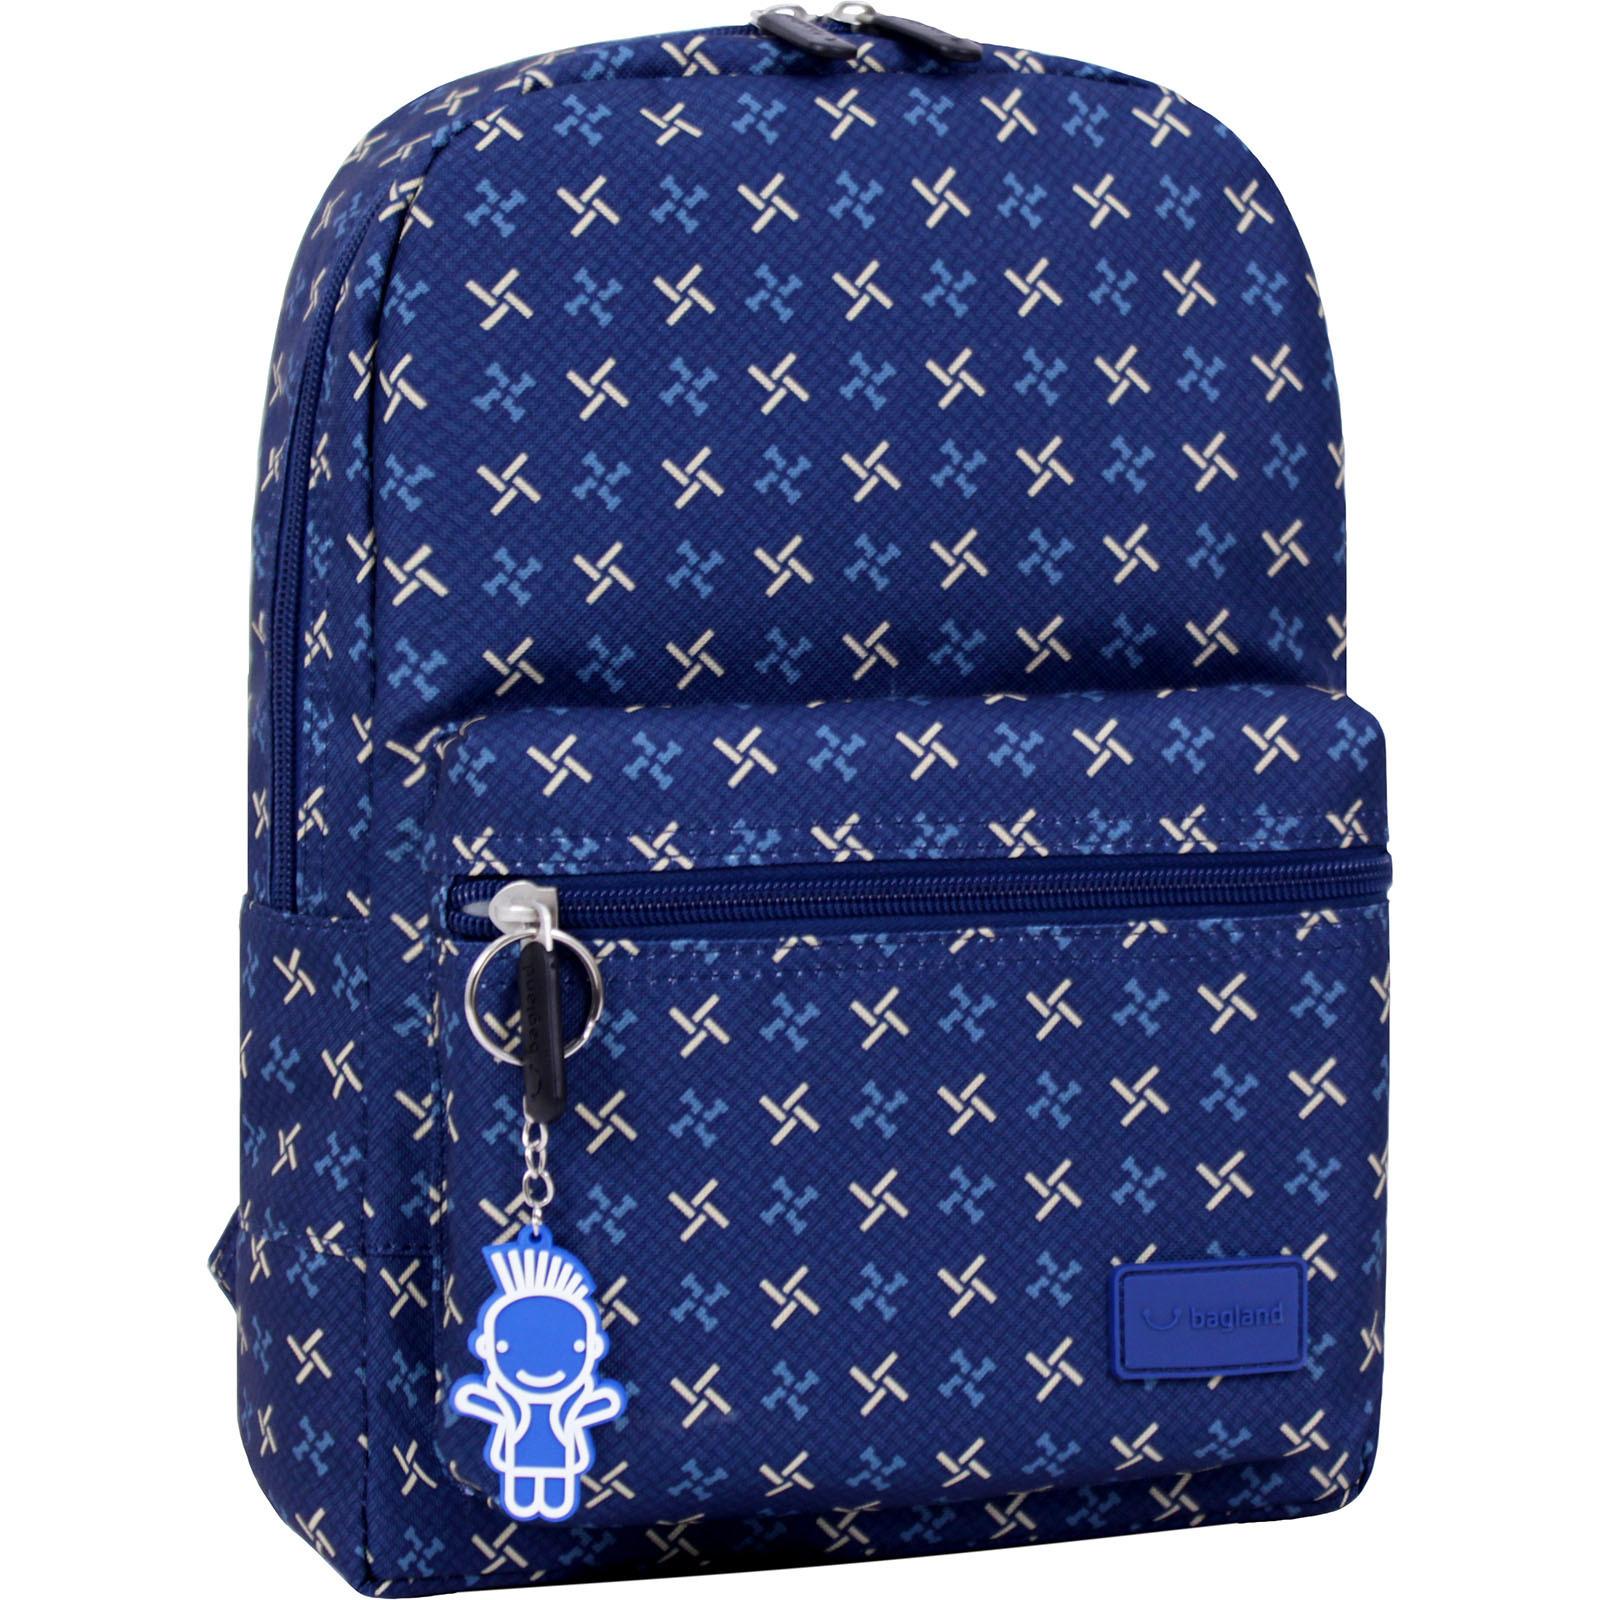 Молодежные рюкзаки Рюкзак Bagland Молодежный mini 8 л. сублимация (463) (00508664) IMG_3673_суб.463_.JPG